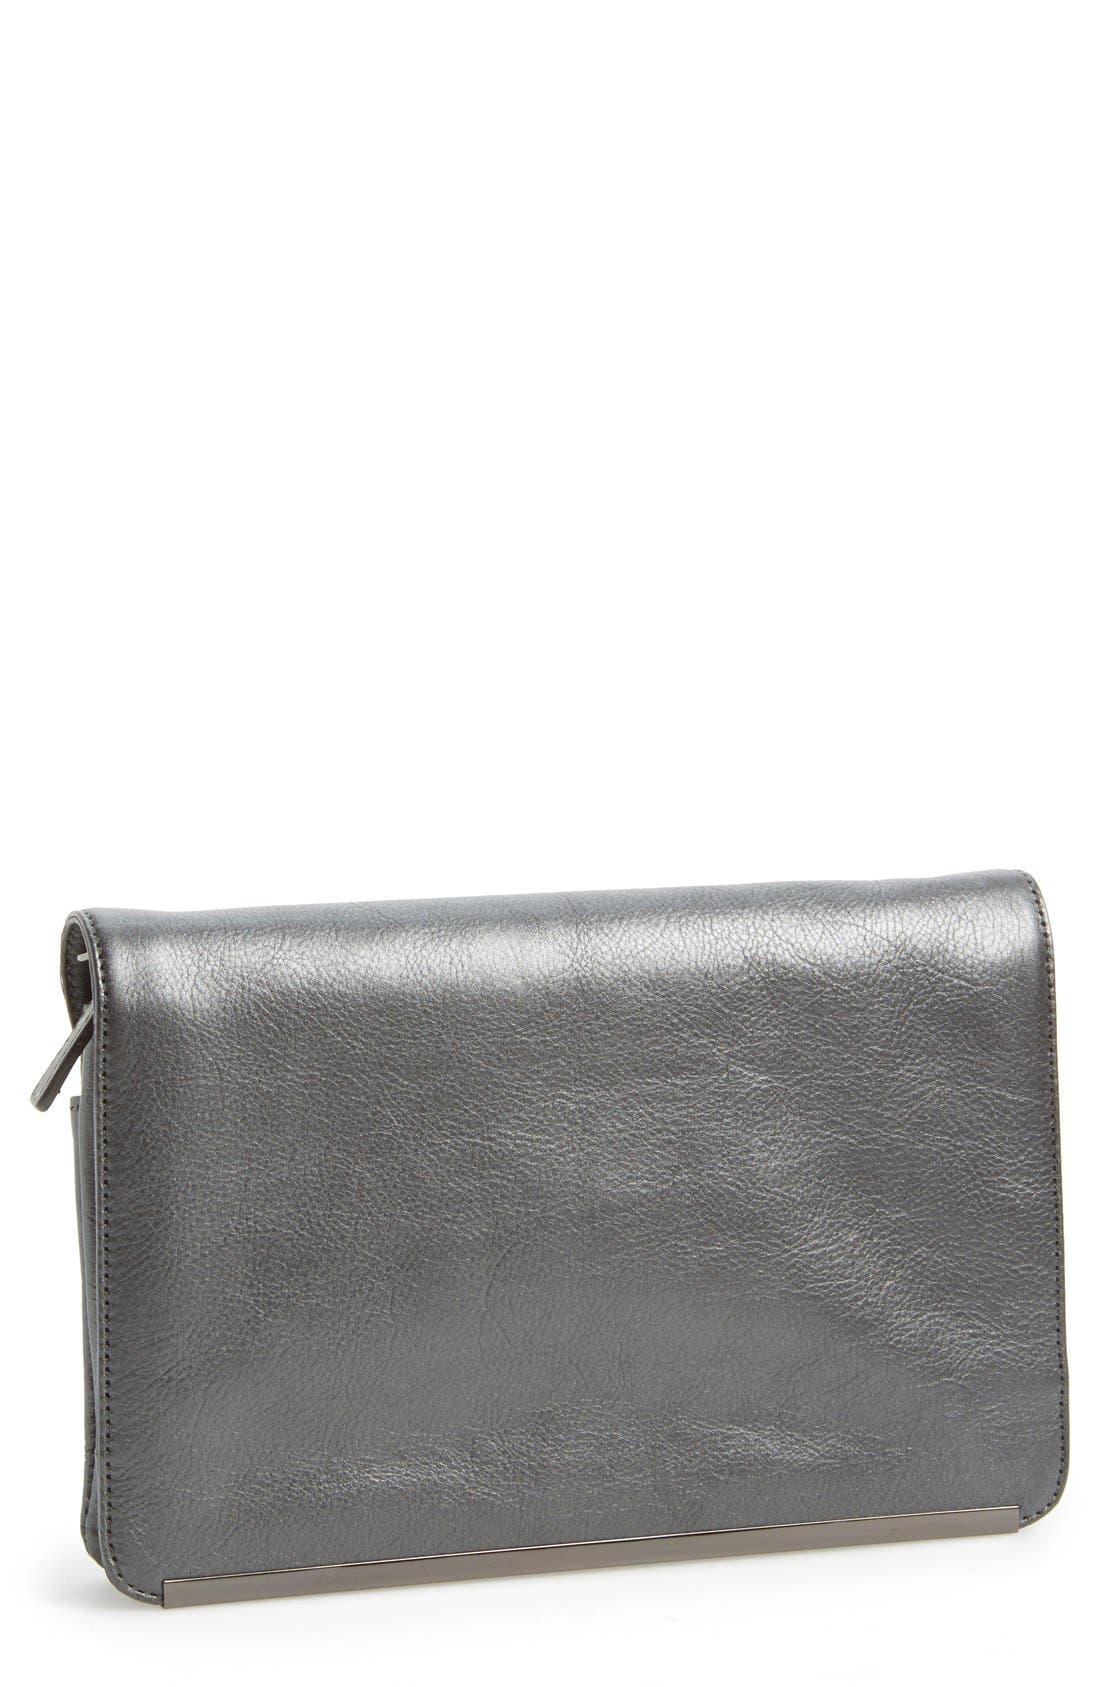 Alternate Image 1 Selected - Halogen® Leather Foldover Crossbody Clutch